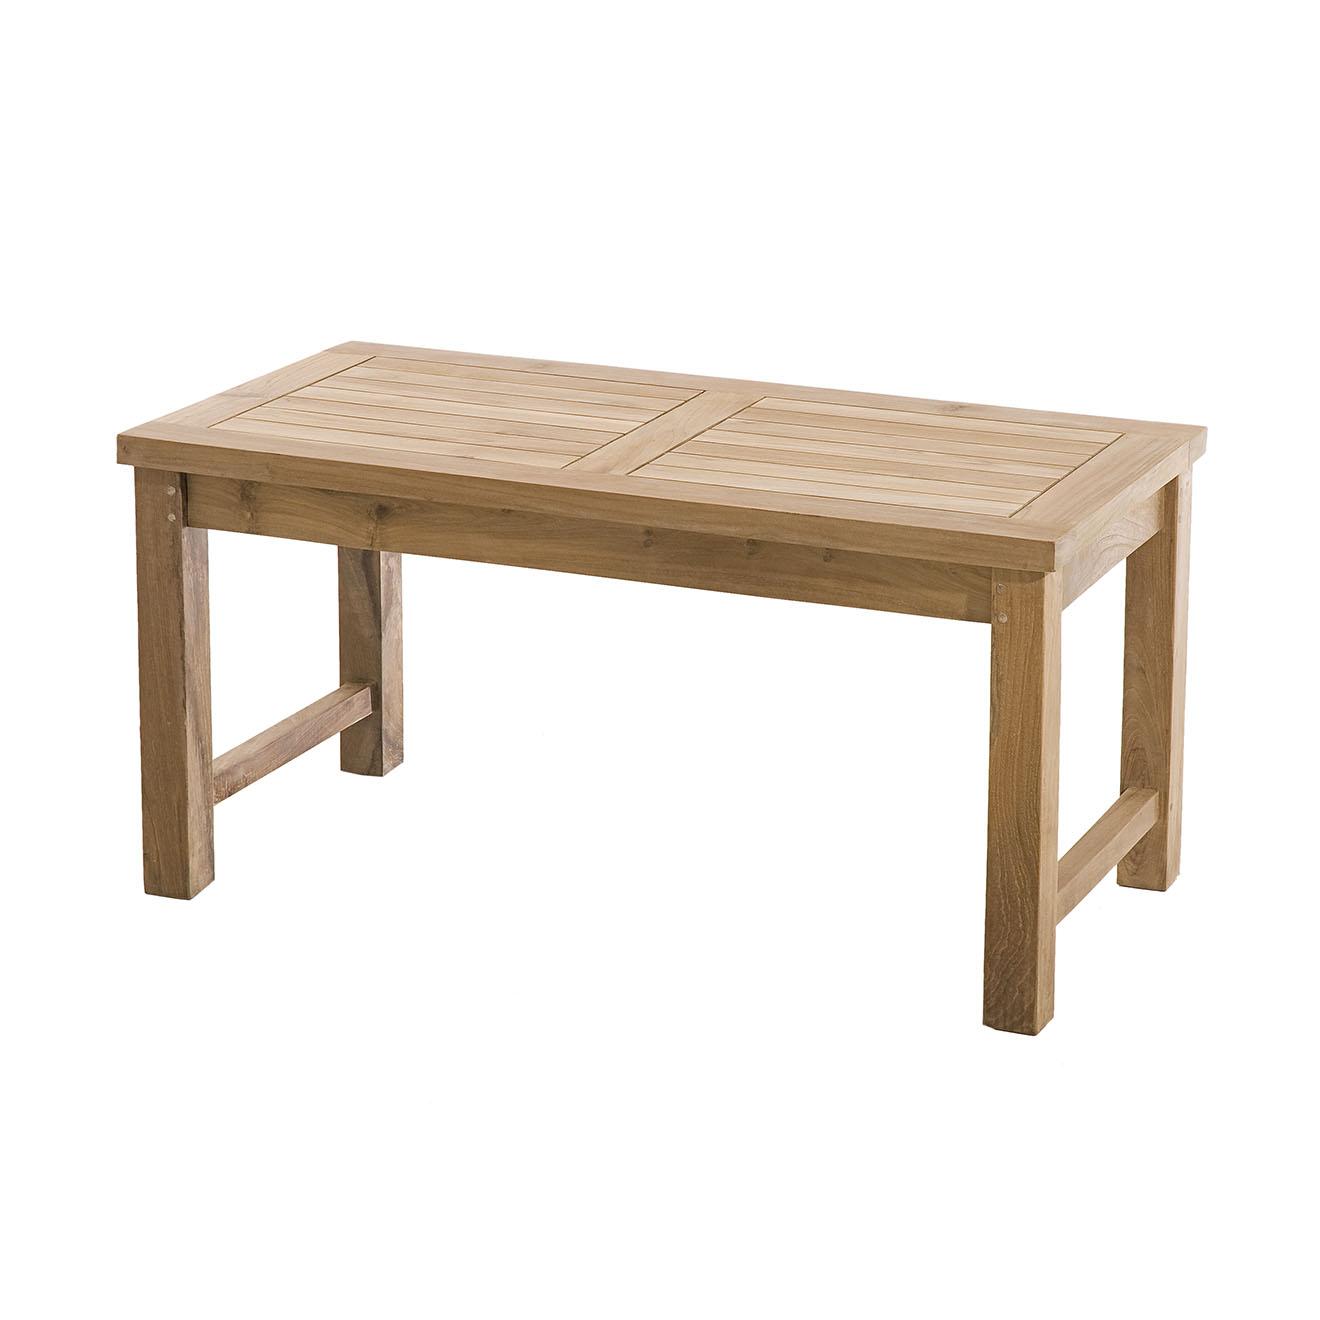 Table basse Fun teck massif - 90x45x45 cm